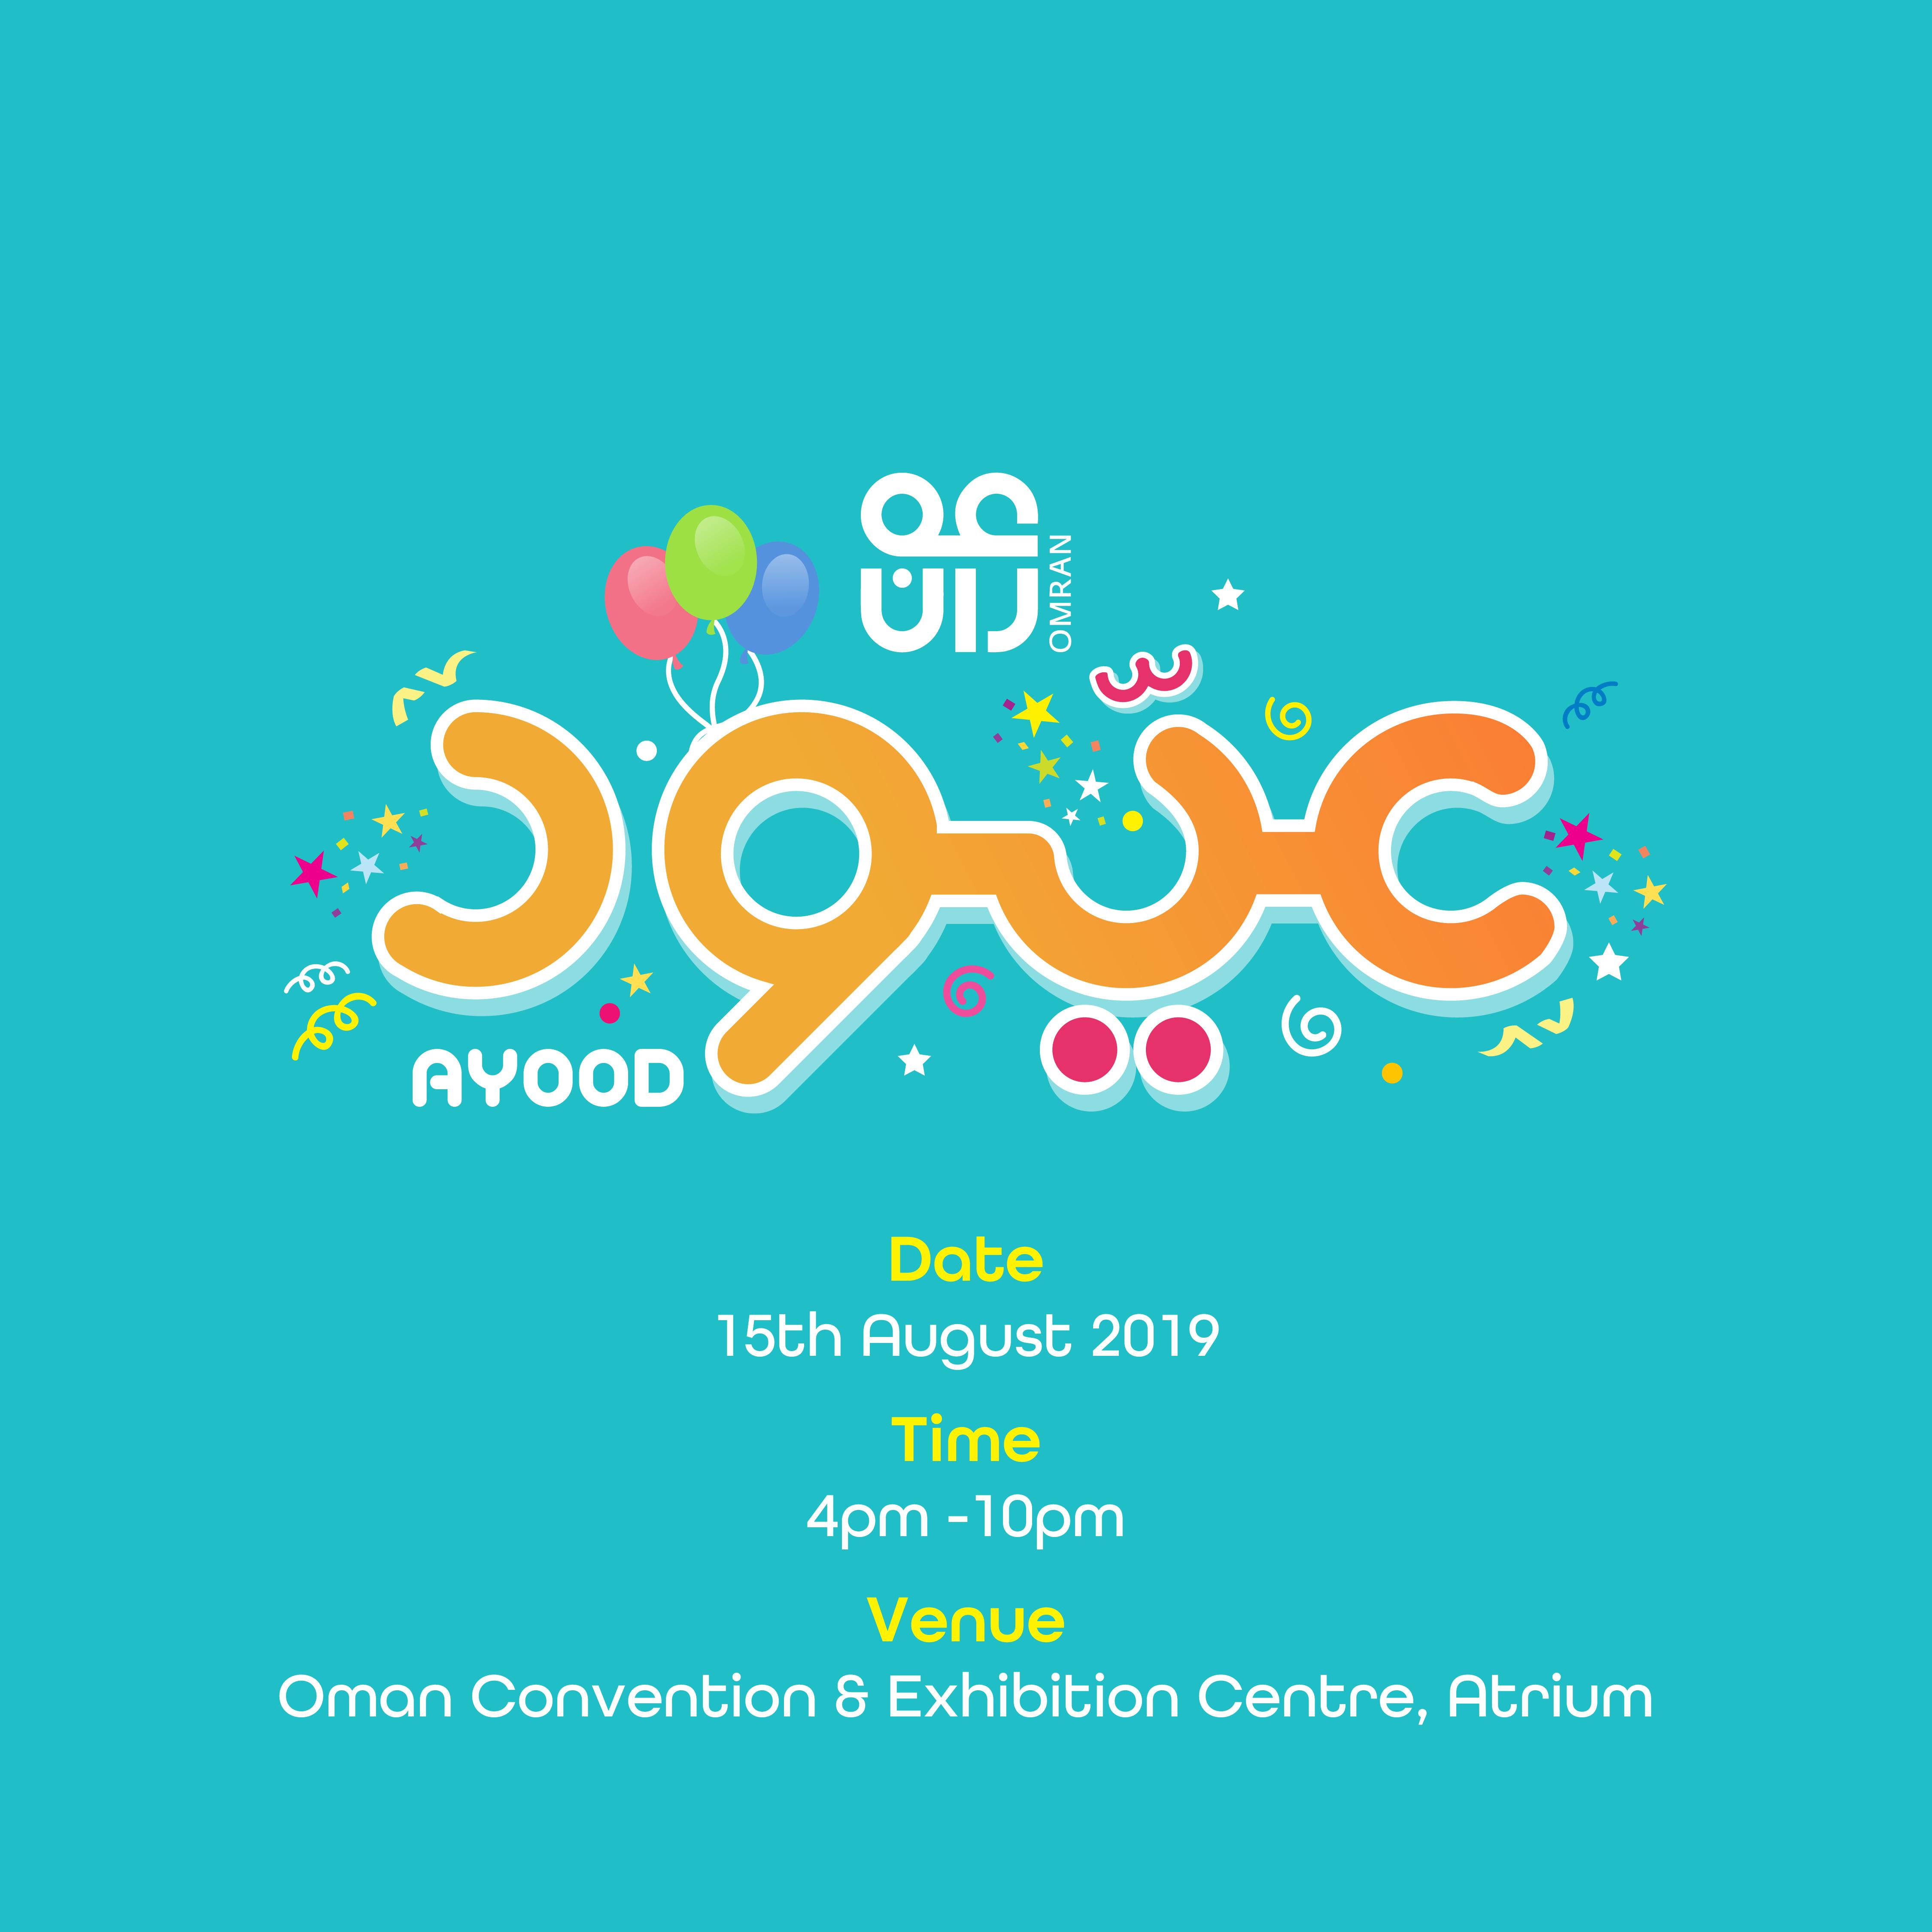 Omran to host recreational event during Eid Al-Adha break